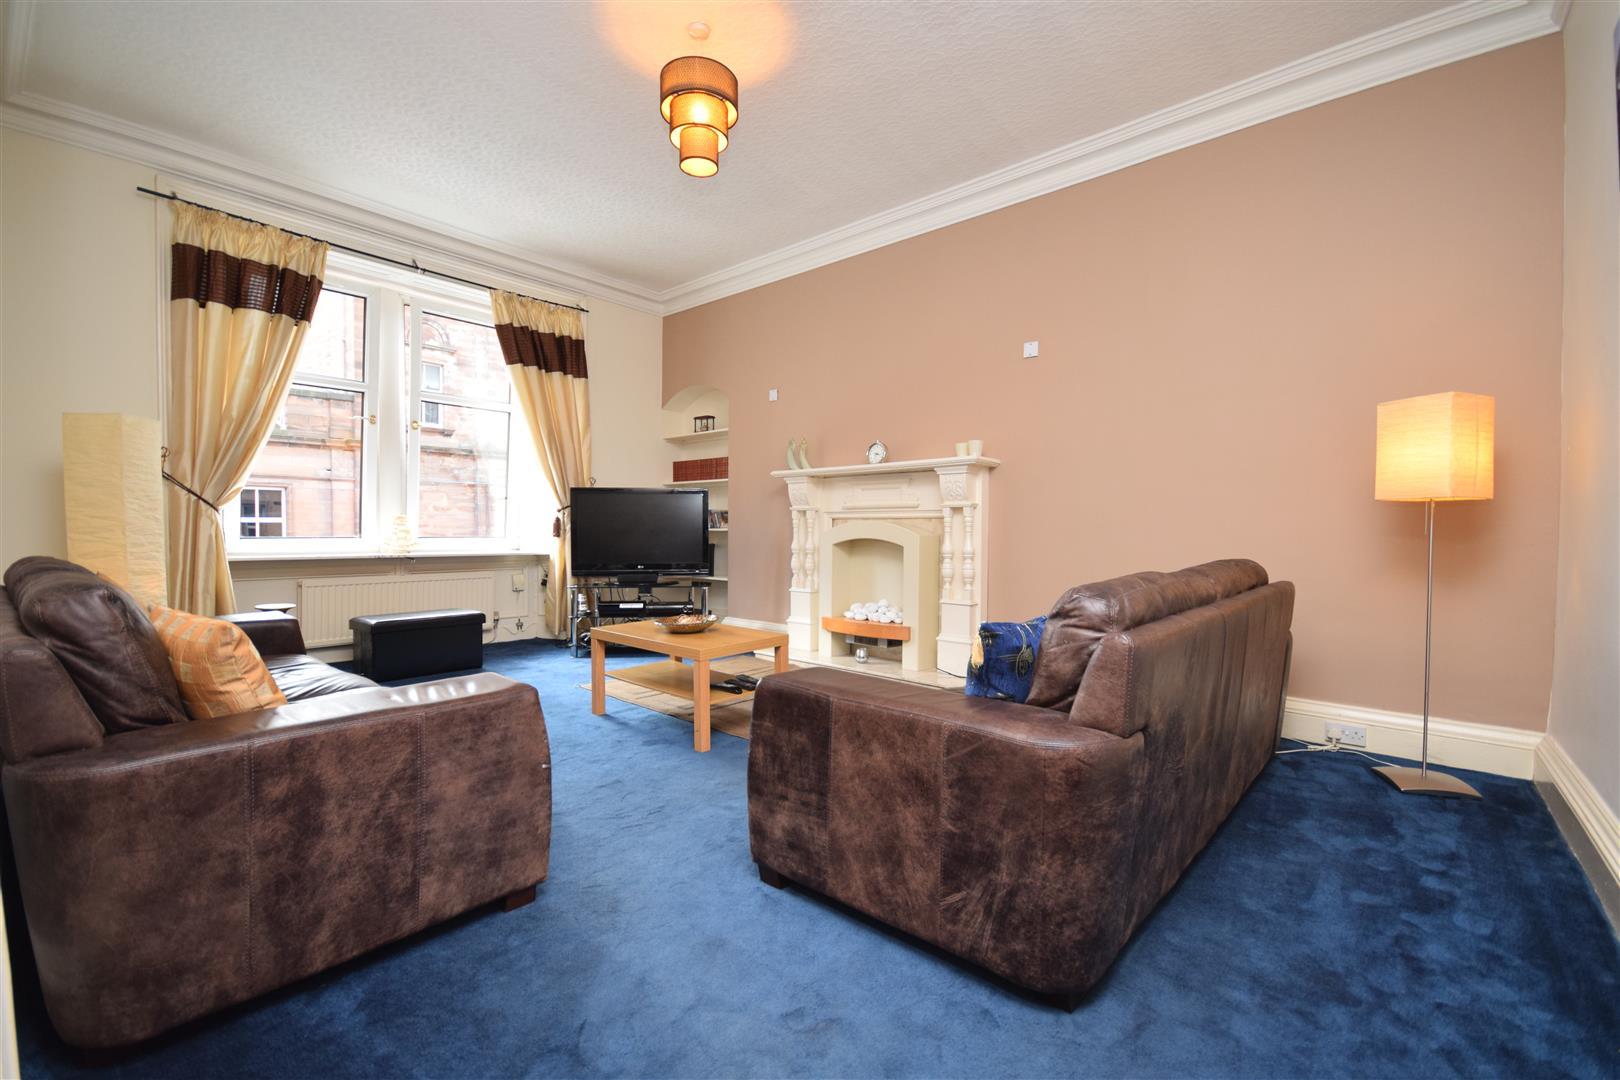 Flat 1, 13, Kinnoull Street, Perth, Perthshire, PH1 5EN, UK